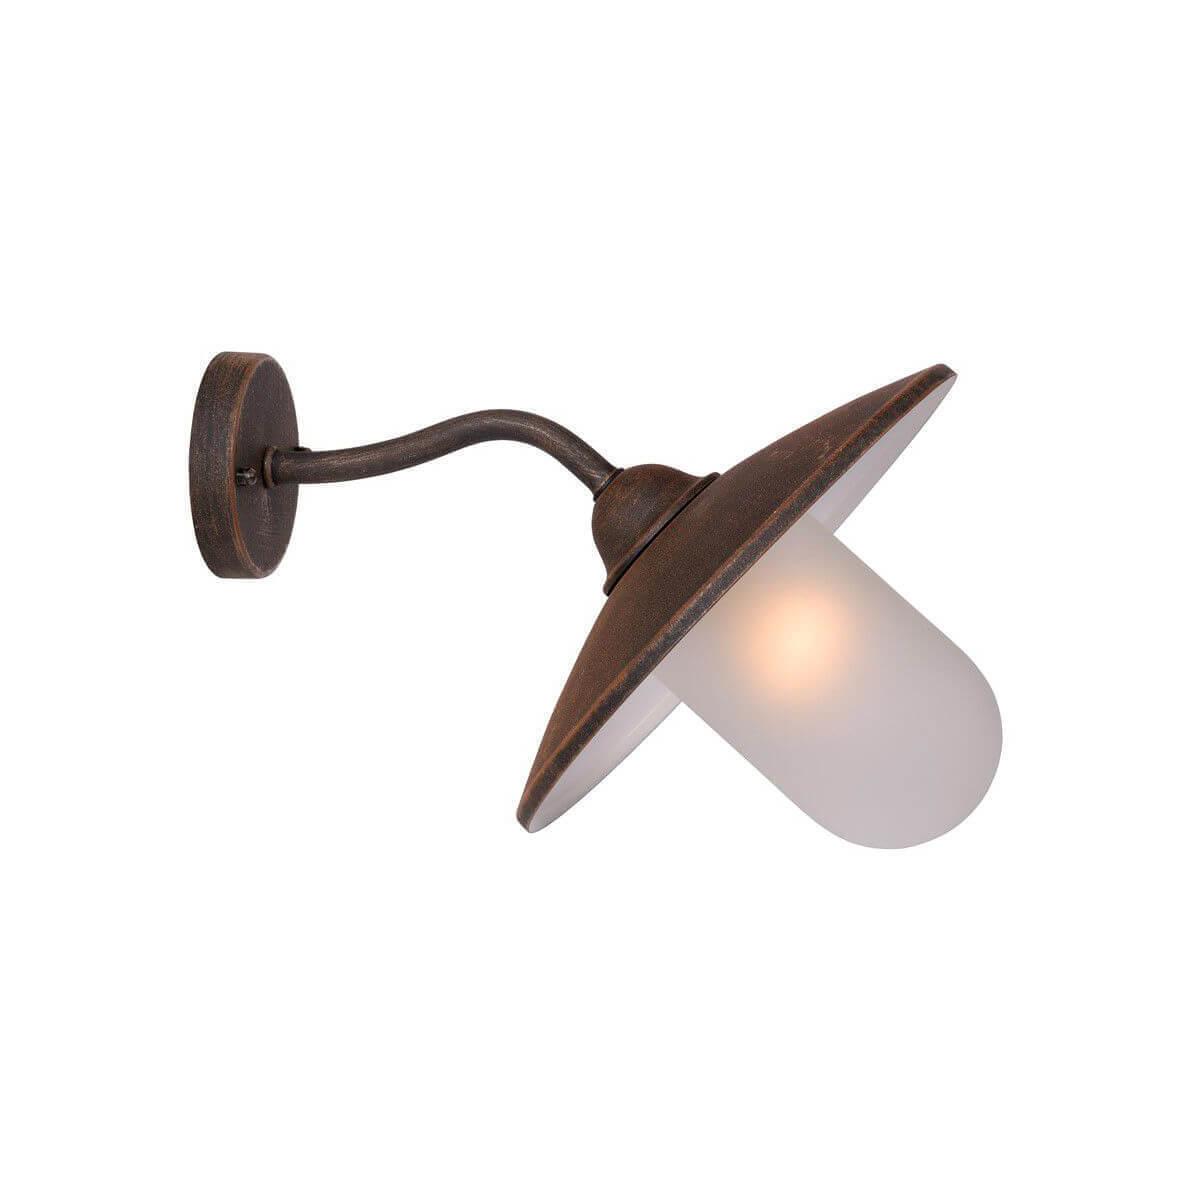 Светильник Lucide 11870/01/97 Aruba Rust brown lucide подвесной светильник lucide honore 45354 01 97